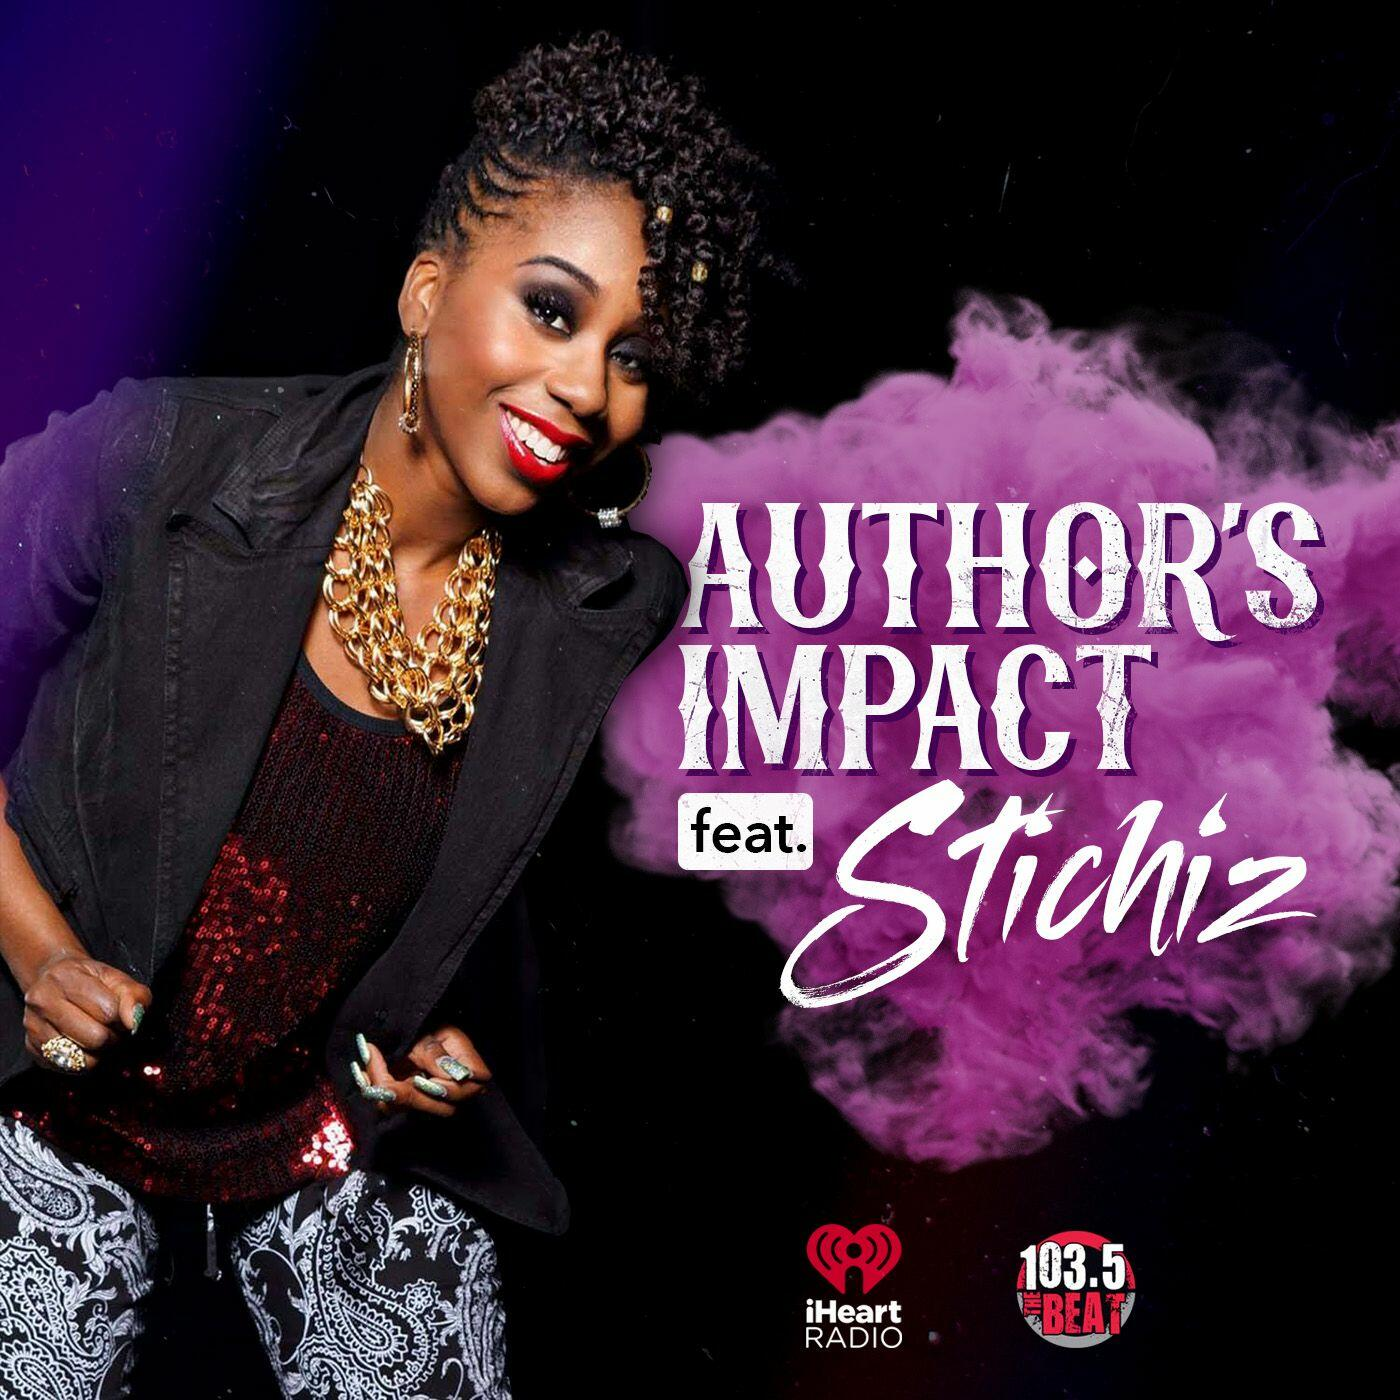 Author's Impact feat. Stichiz